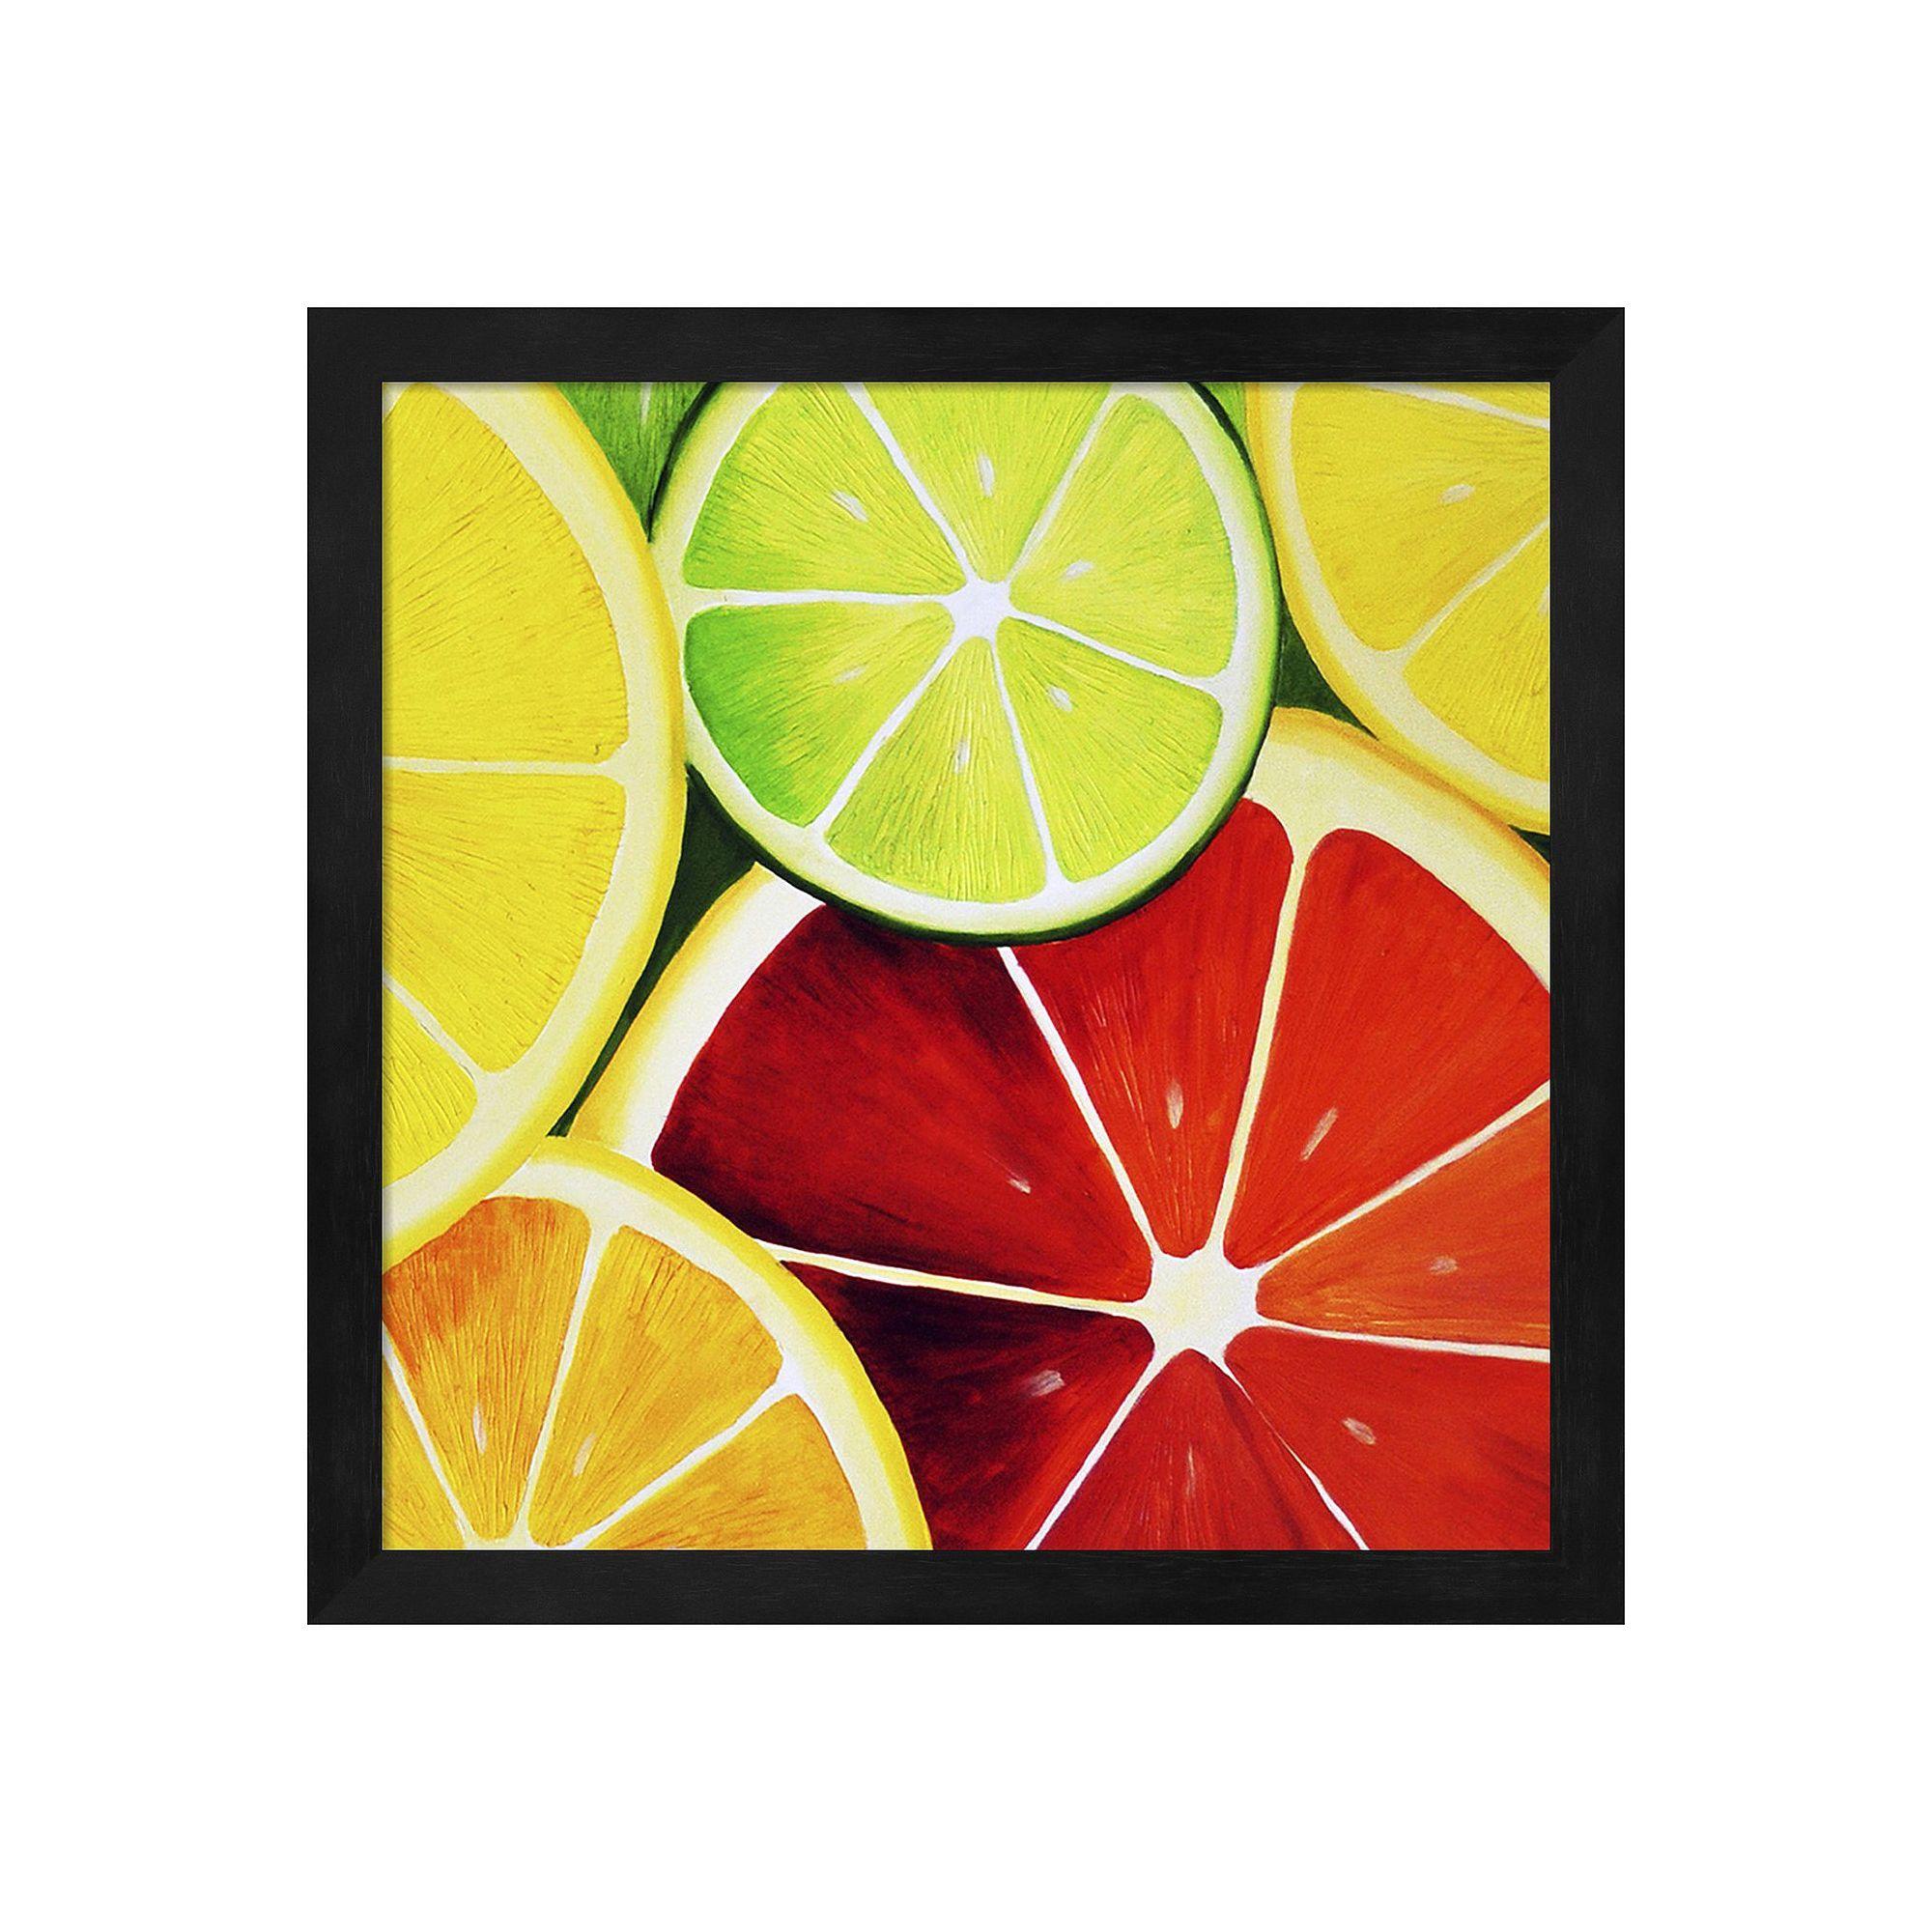 Metaverse Art Sliced Grapefruit Framed Wall Art, Black | Framed wall ...